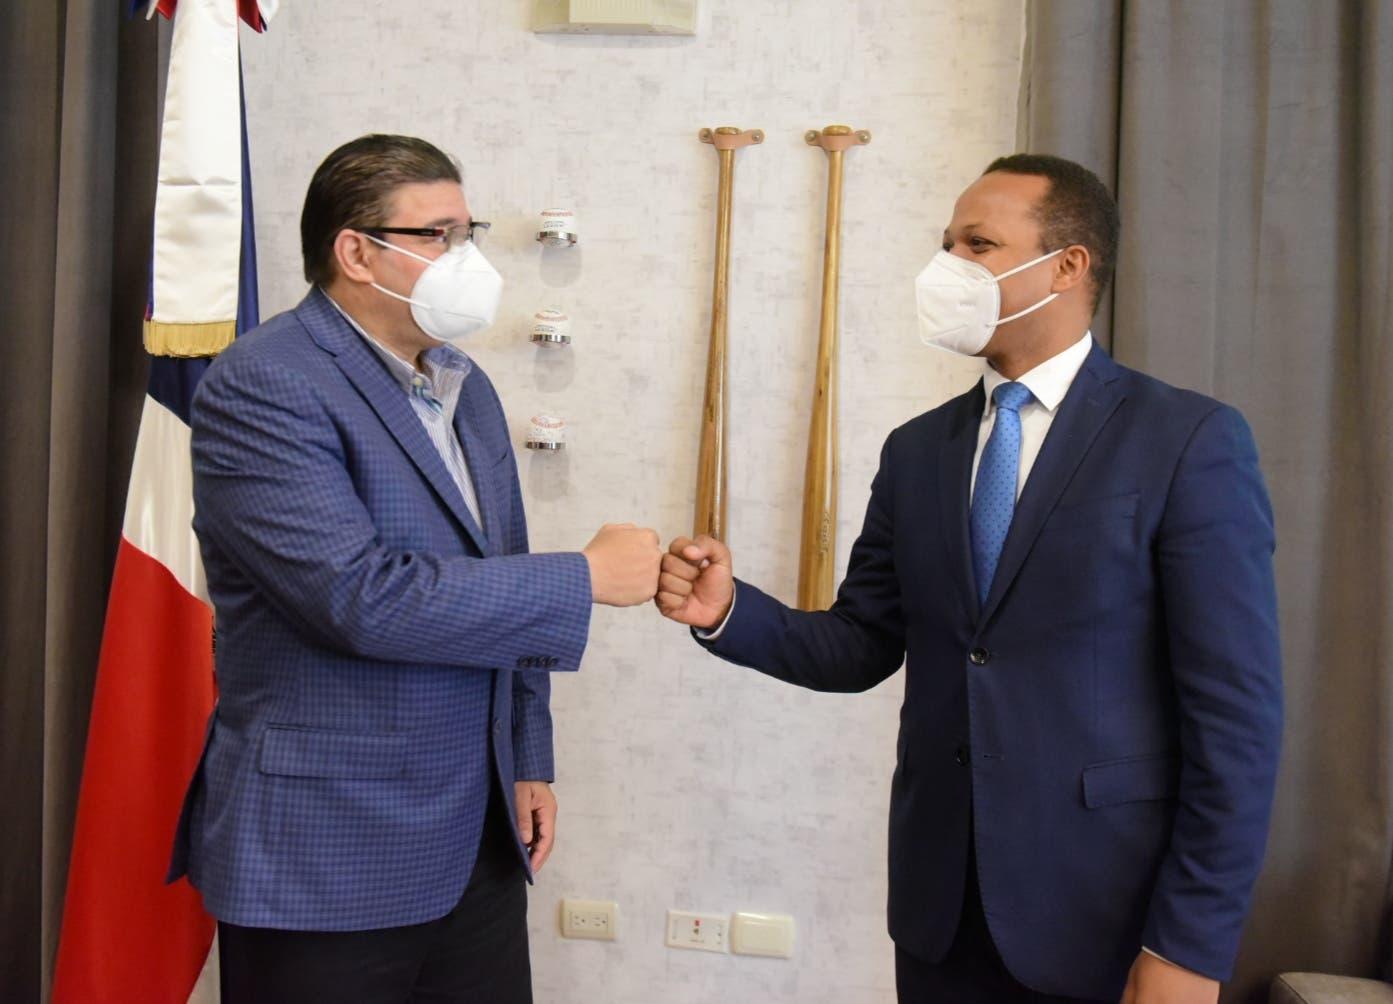 Ministro de deportes anuncia alumbrado completo del Centro Olímpico